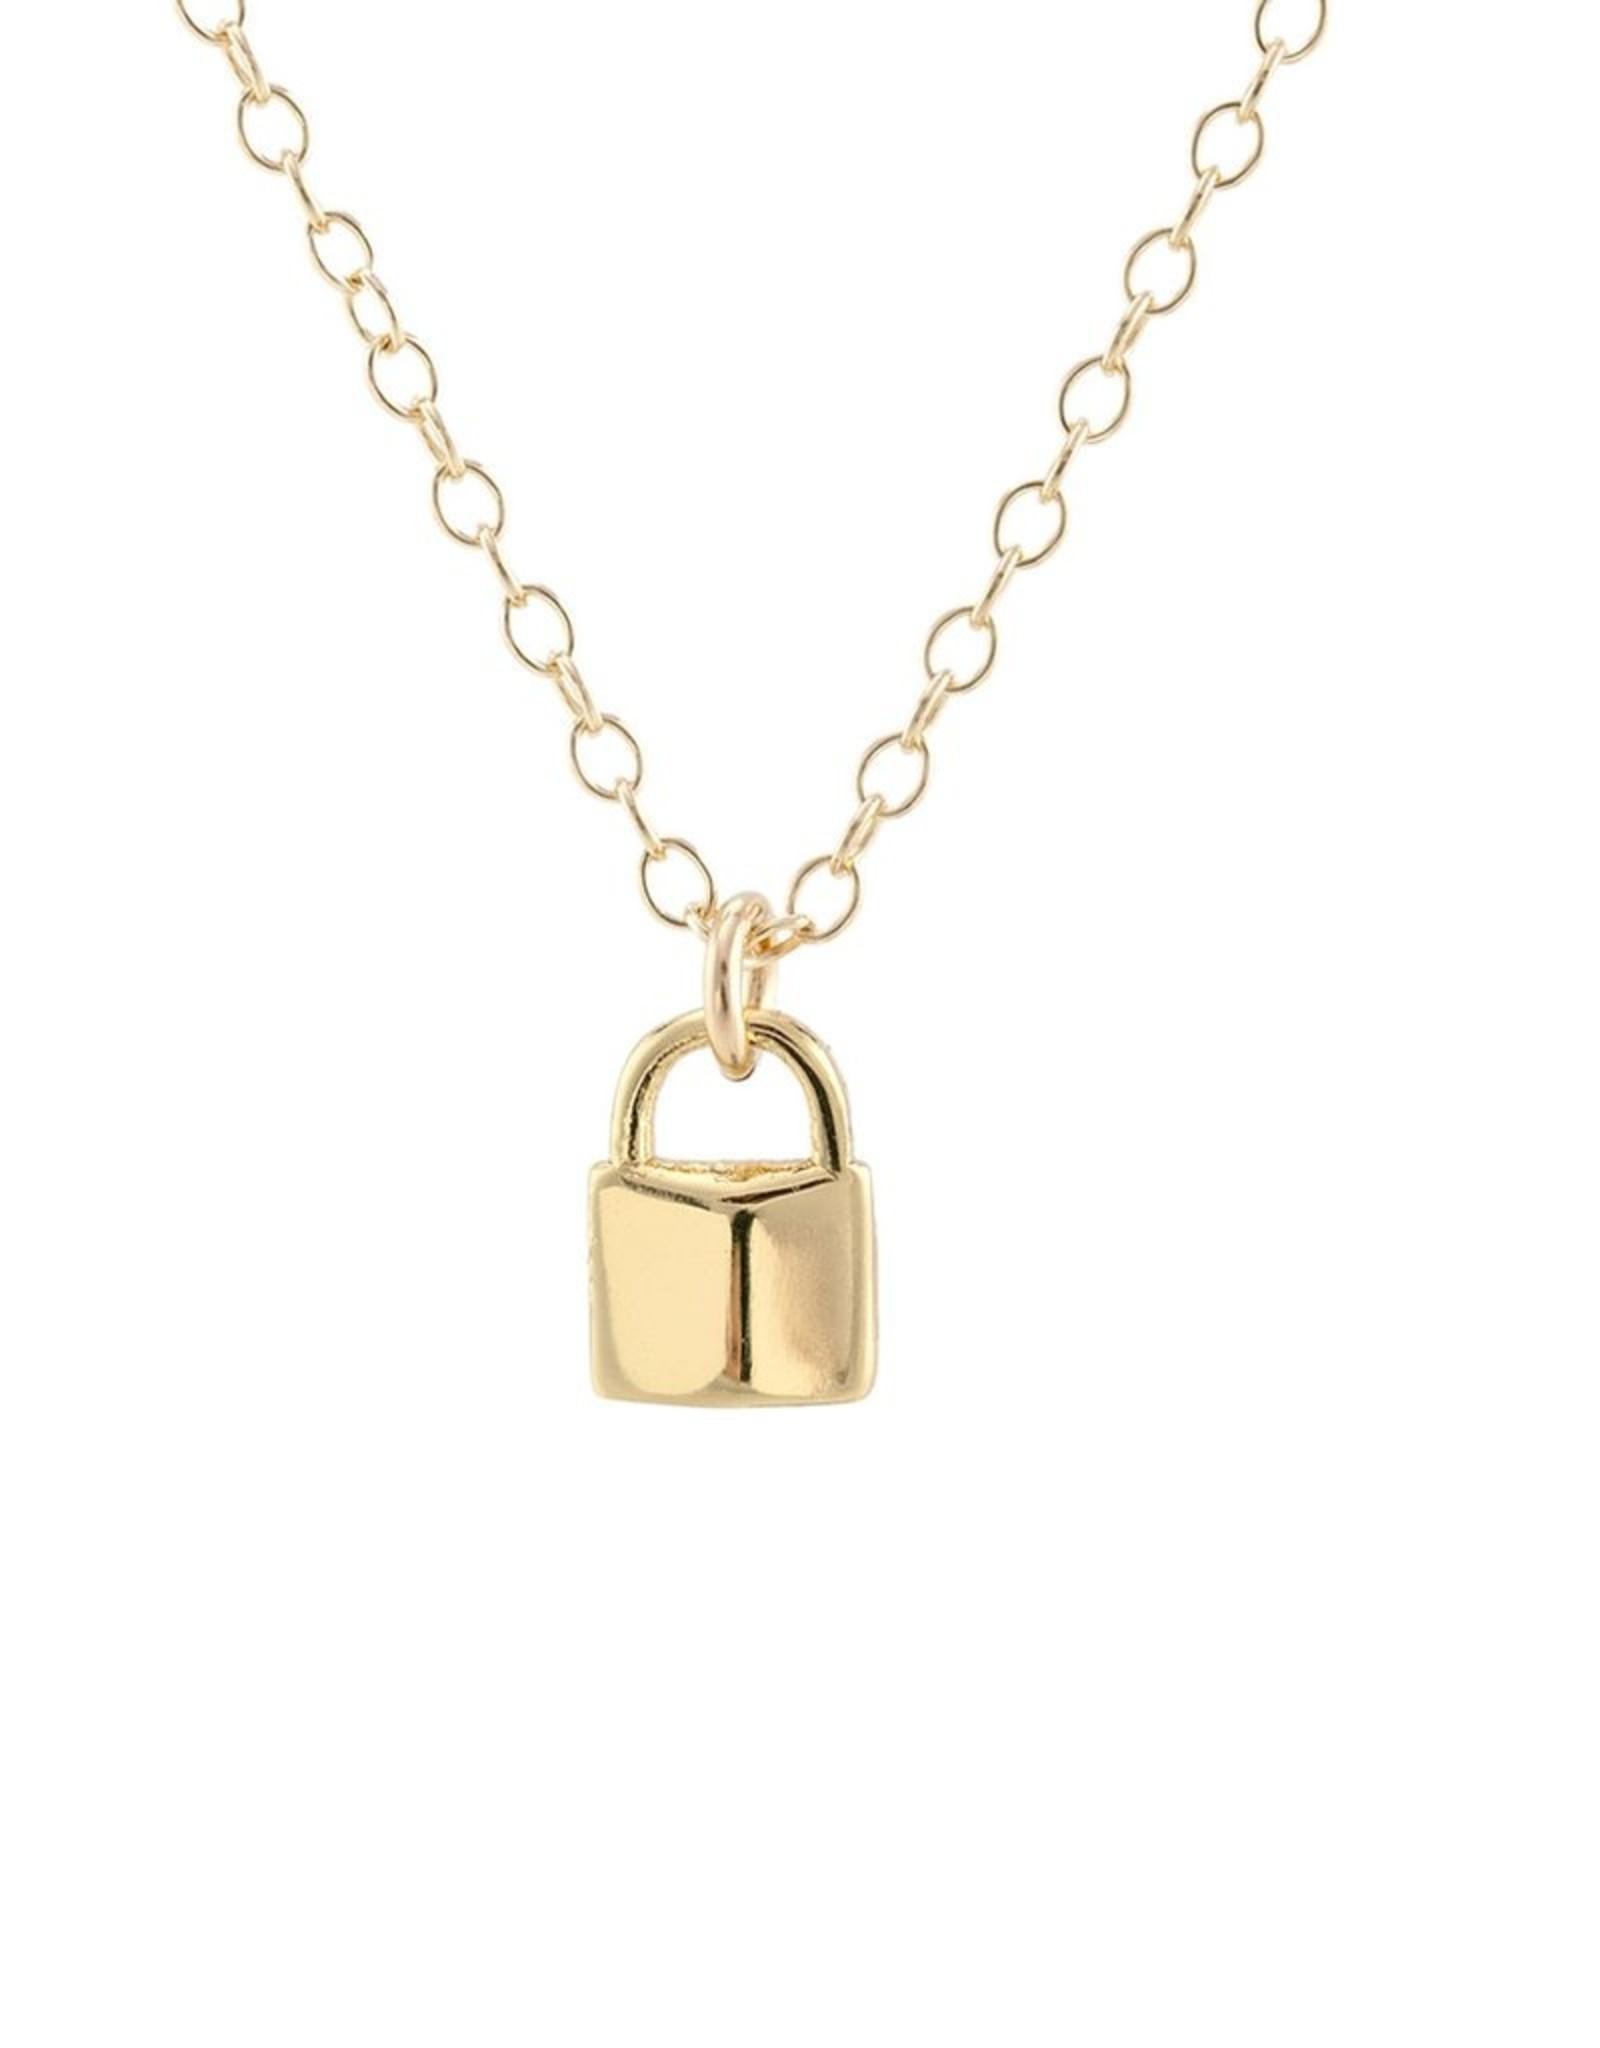 Kris Nations Padlock Charm Necklace